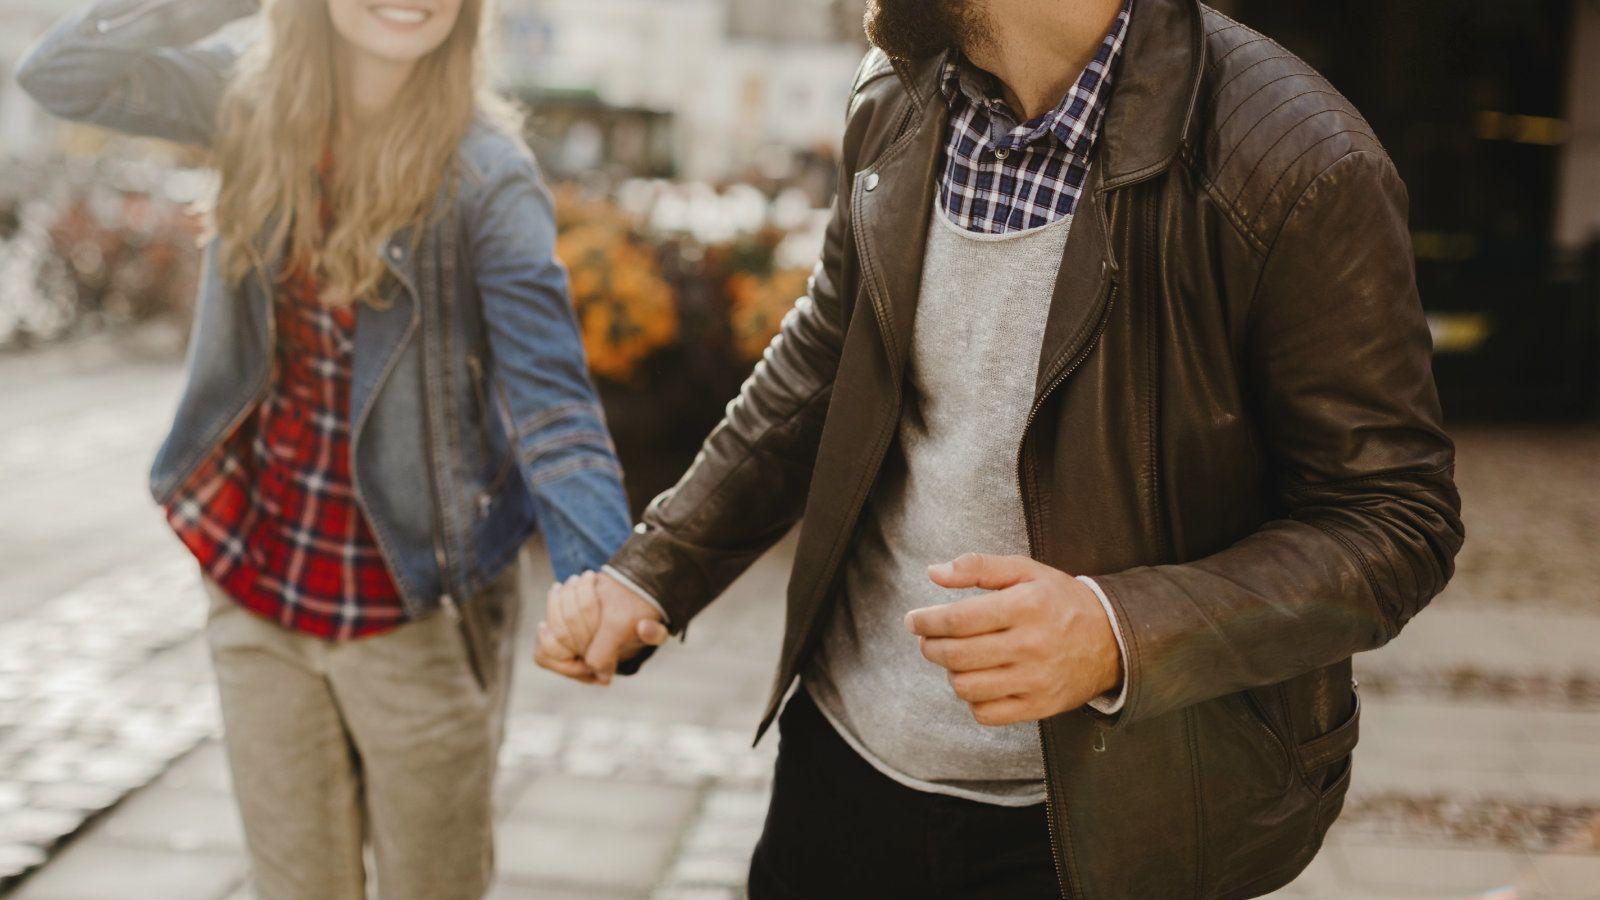 meet girls for dating